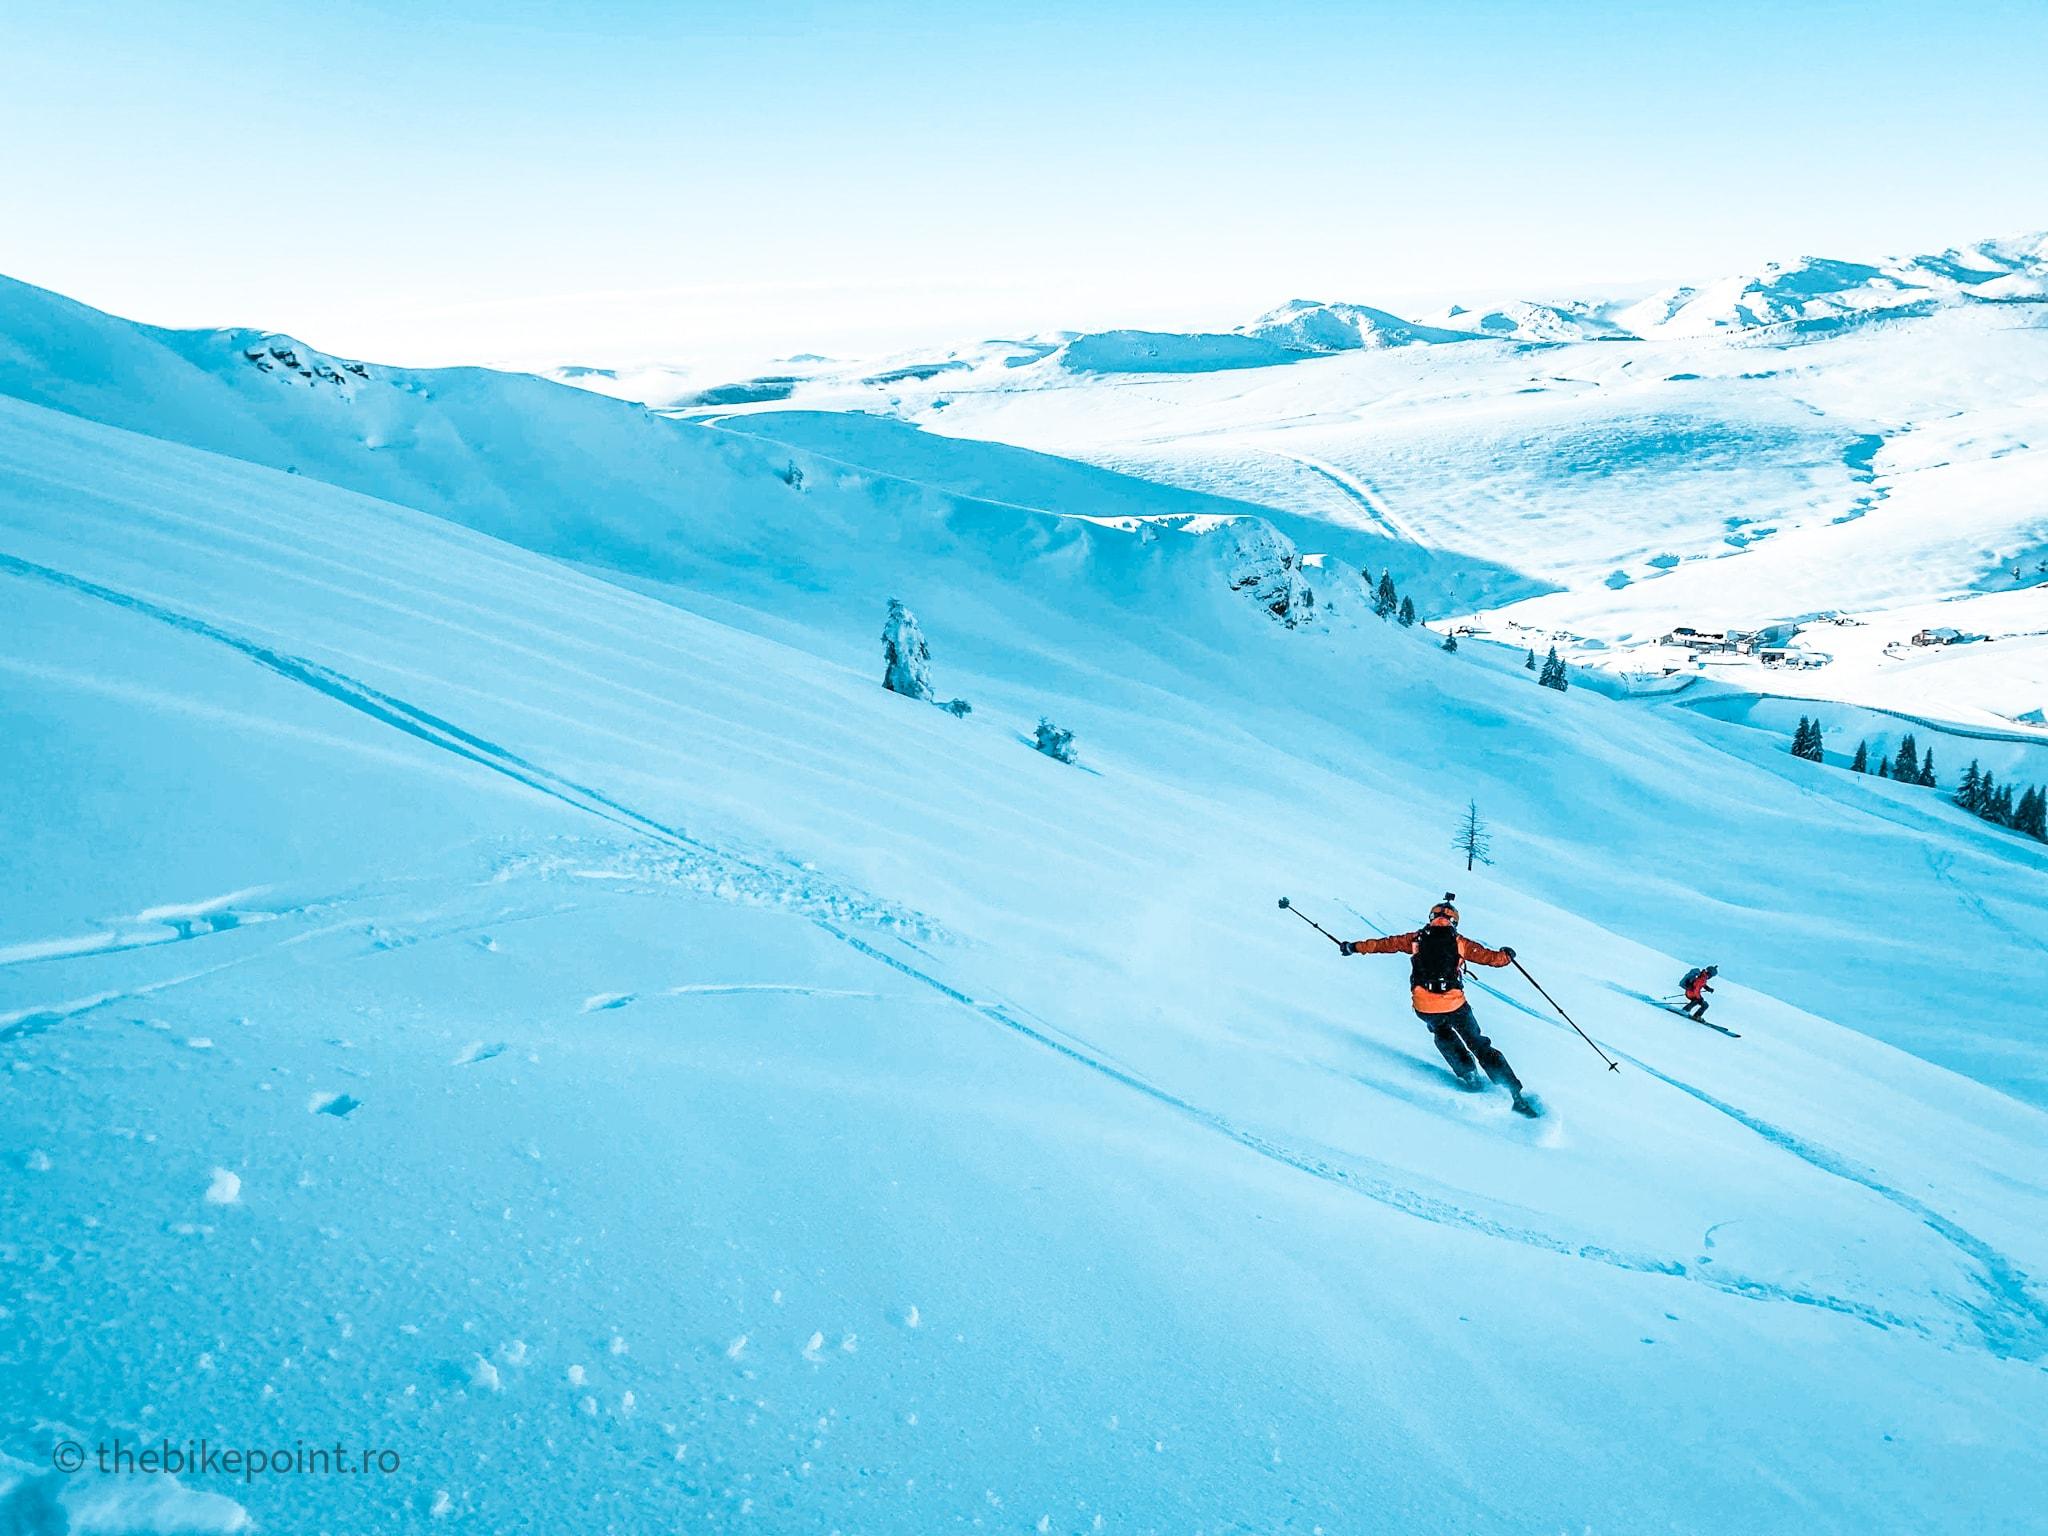 Prima zi de schi de tura din pandemie - thebikepoint.ro